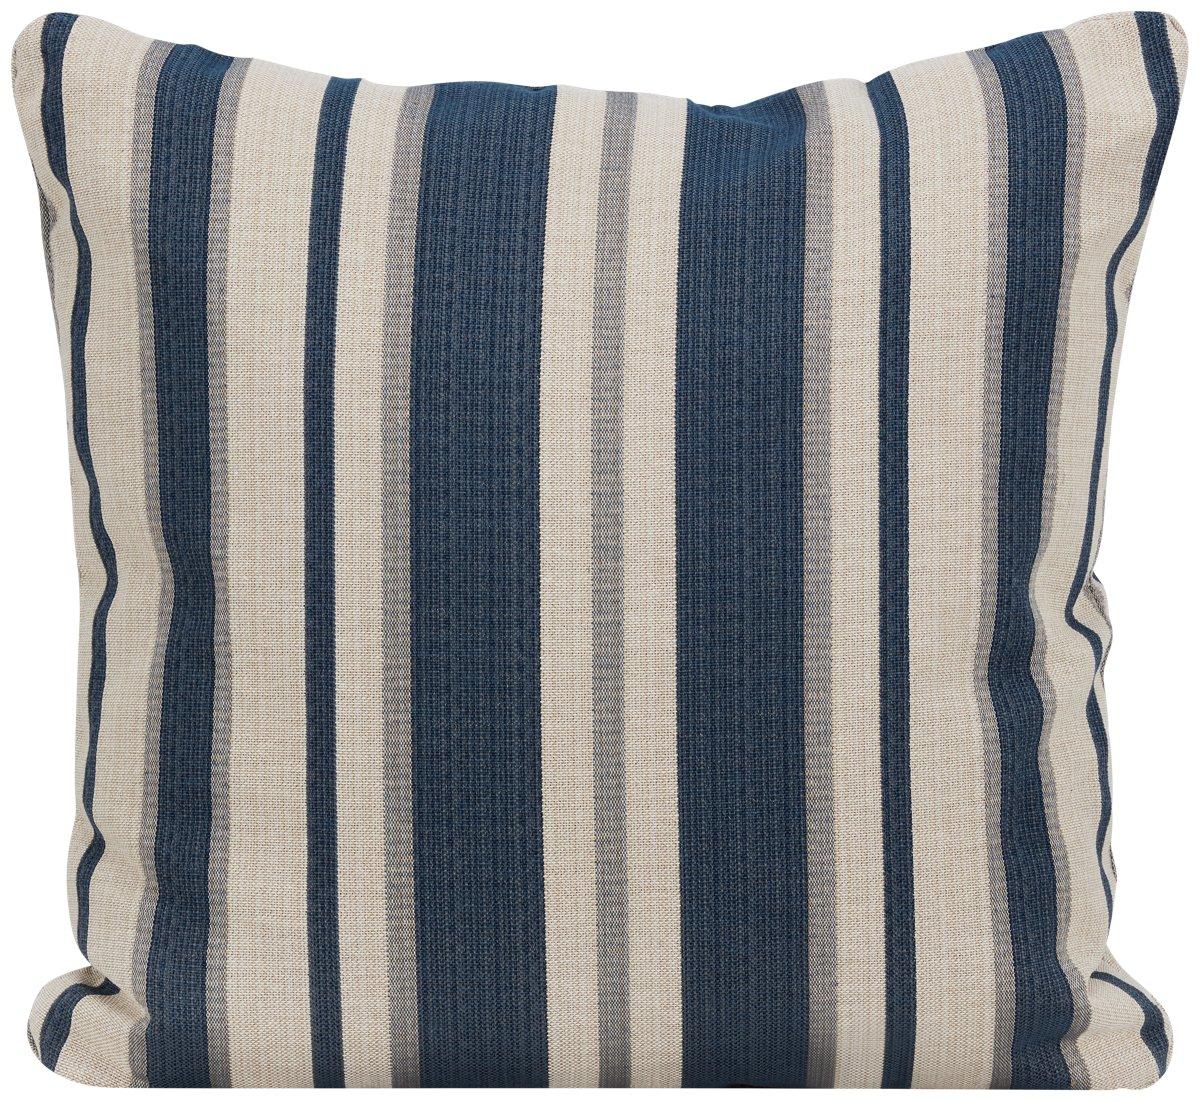 Chad Dark Blue Fabric Square Accent Pillow